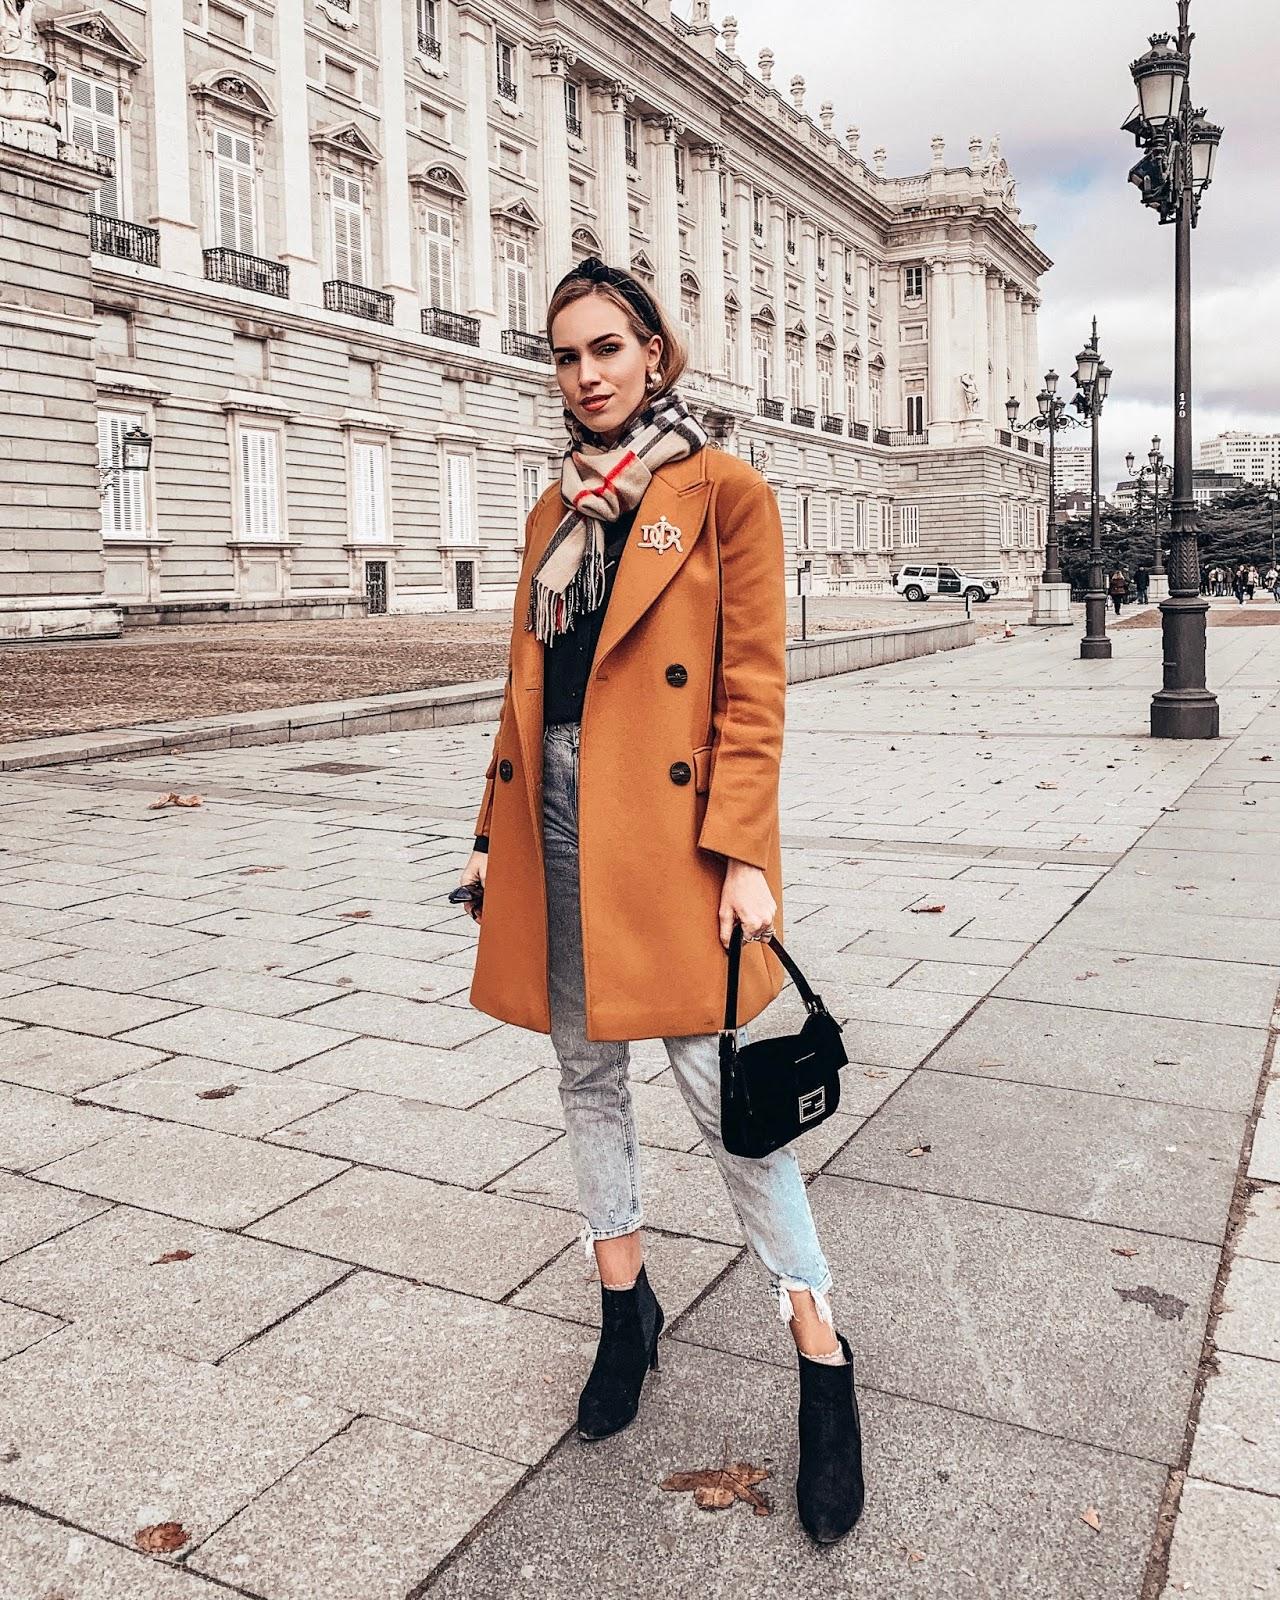 mustard coat blue jeans burberry scarf fendi baguette bag headband spring outfit